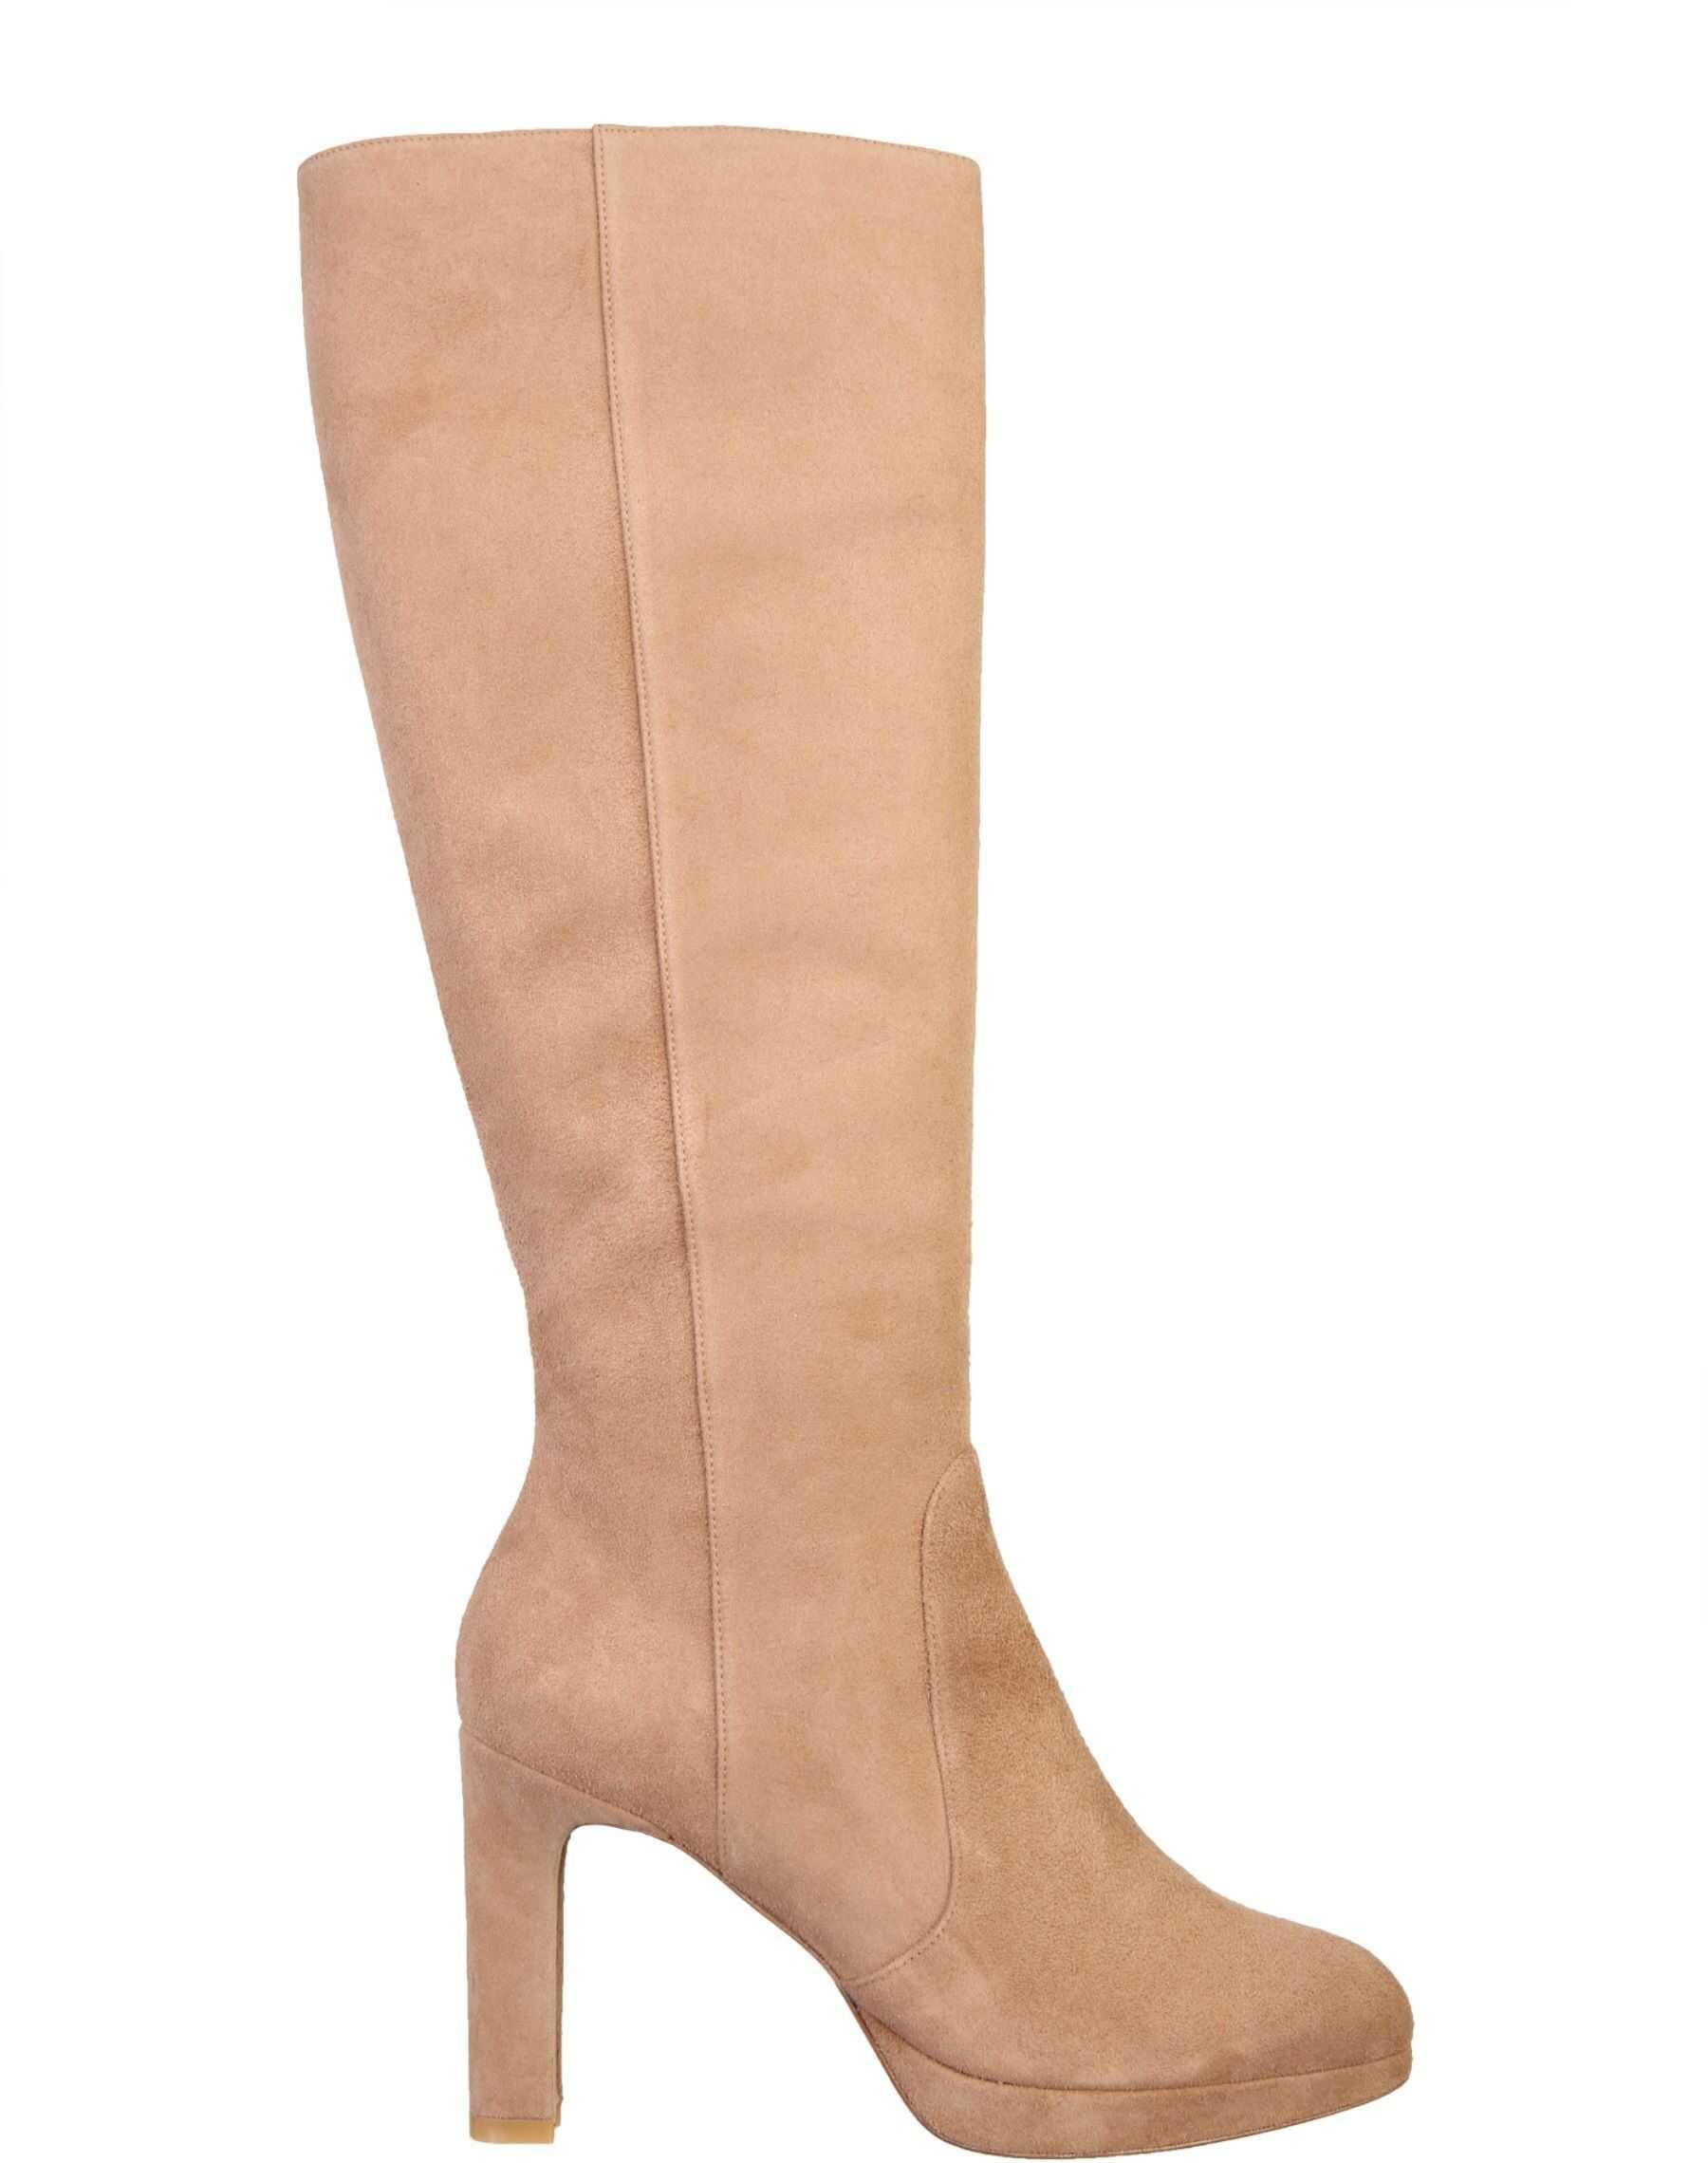 Stuart Weitzman Aleina Boots ALEINA_SUECAM BEIGE imagine b-mall.ro